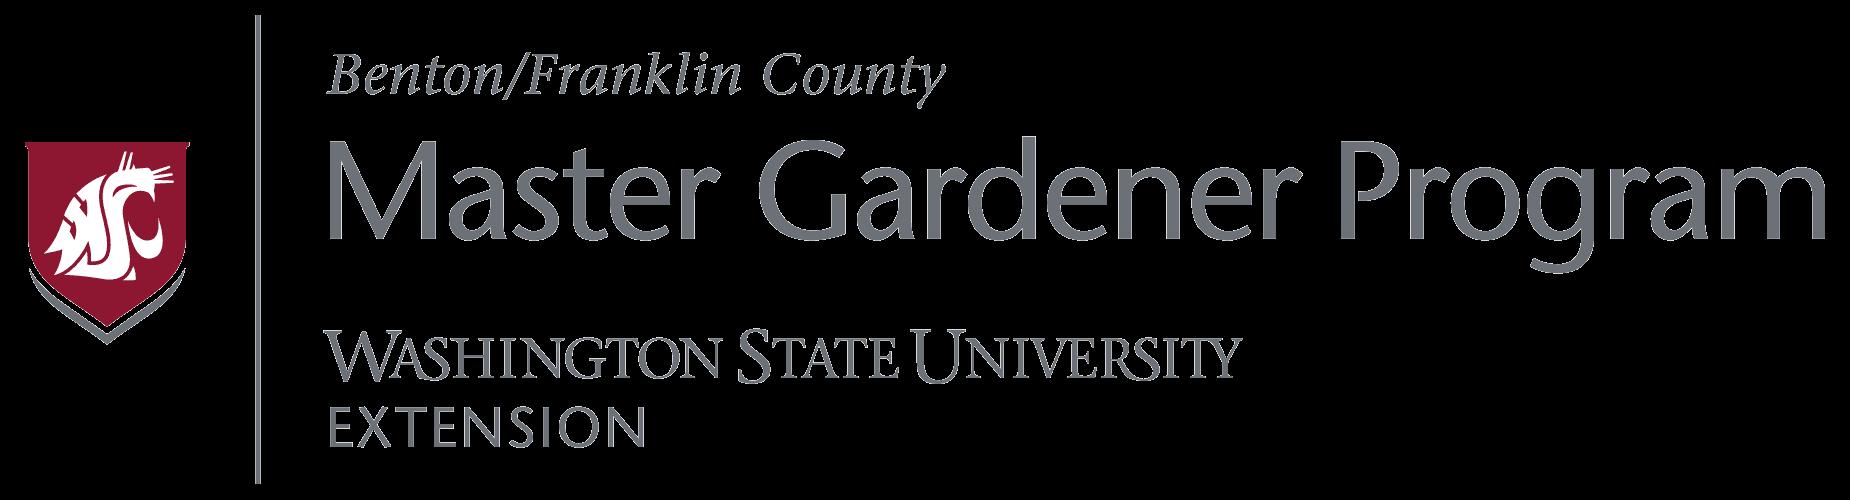 WSU Master Gardener Program logo